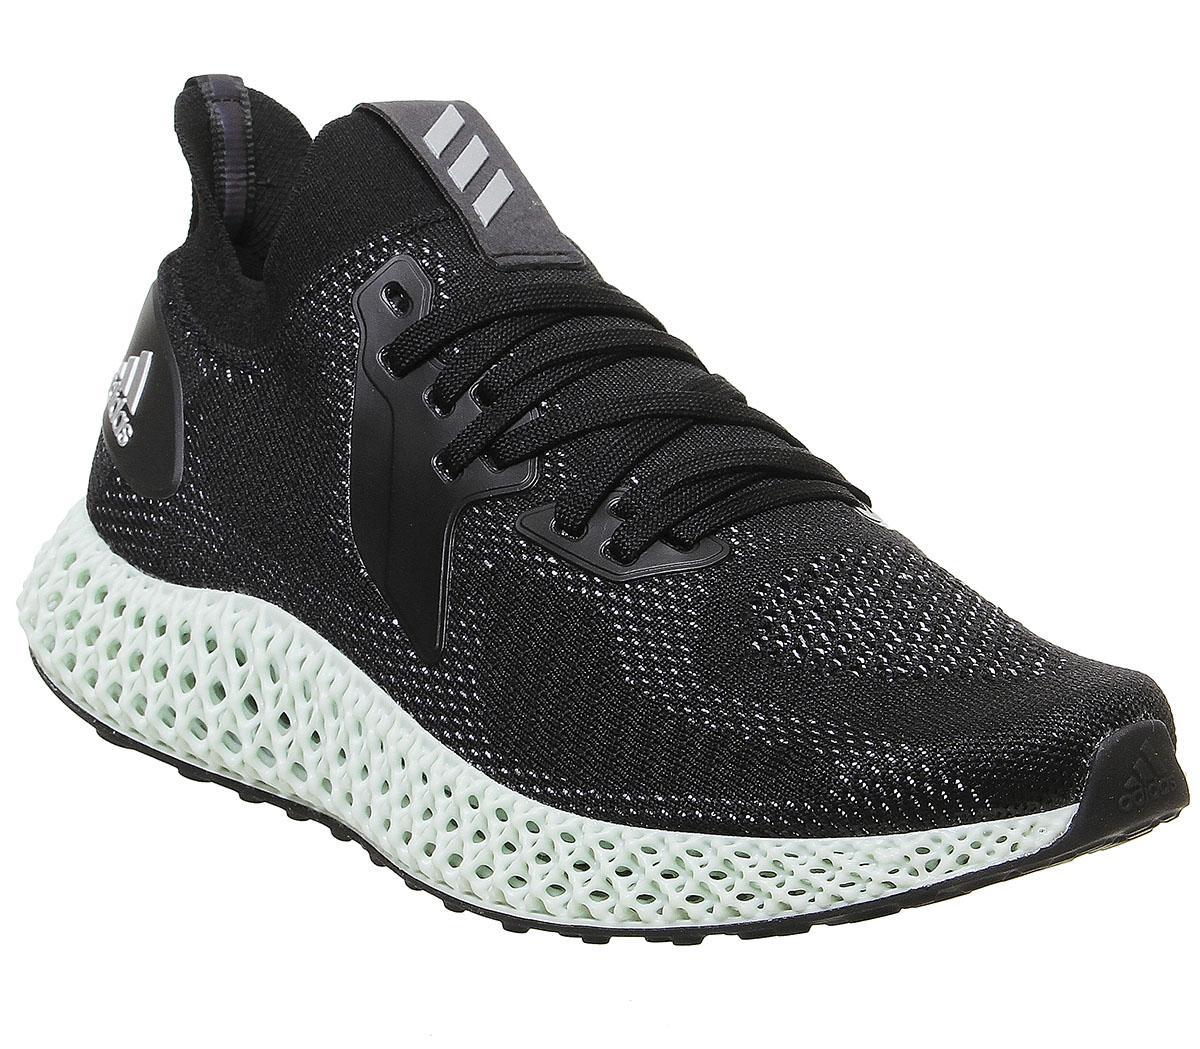 adidas Alphaedge 4d Trainers Black